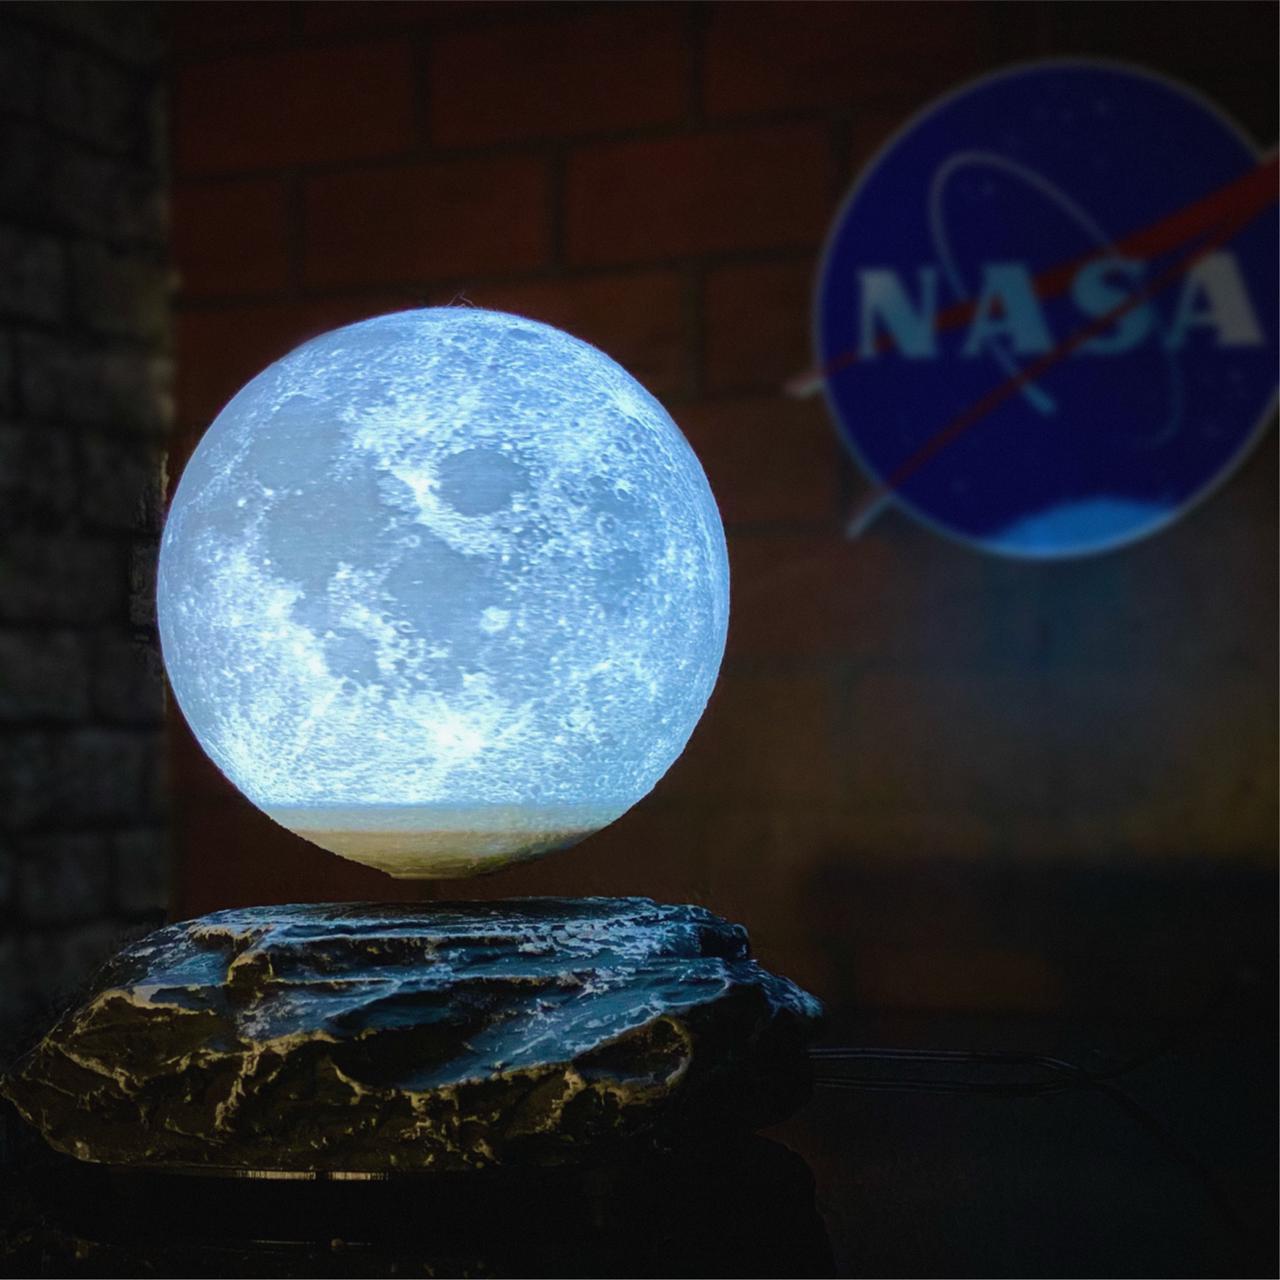 Luminária/Abajur Magnético Flutuante Lua